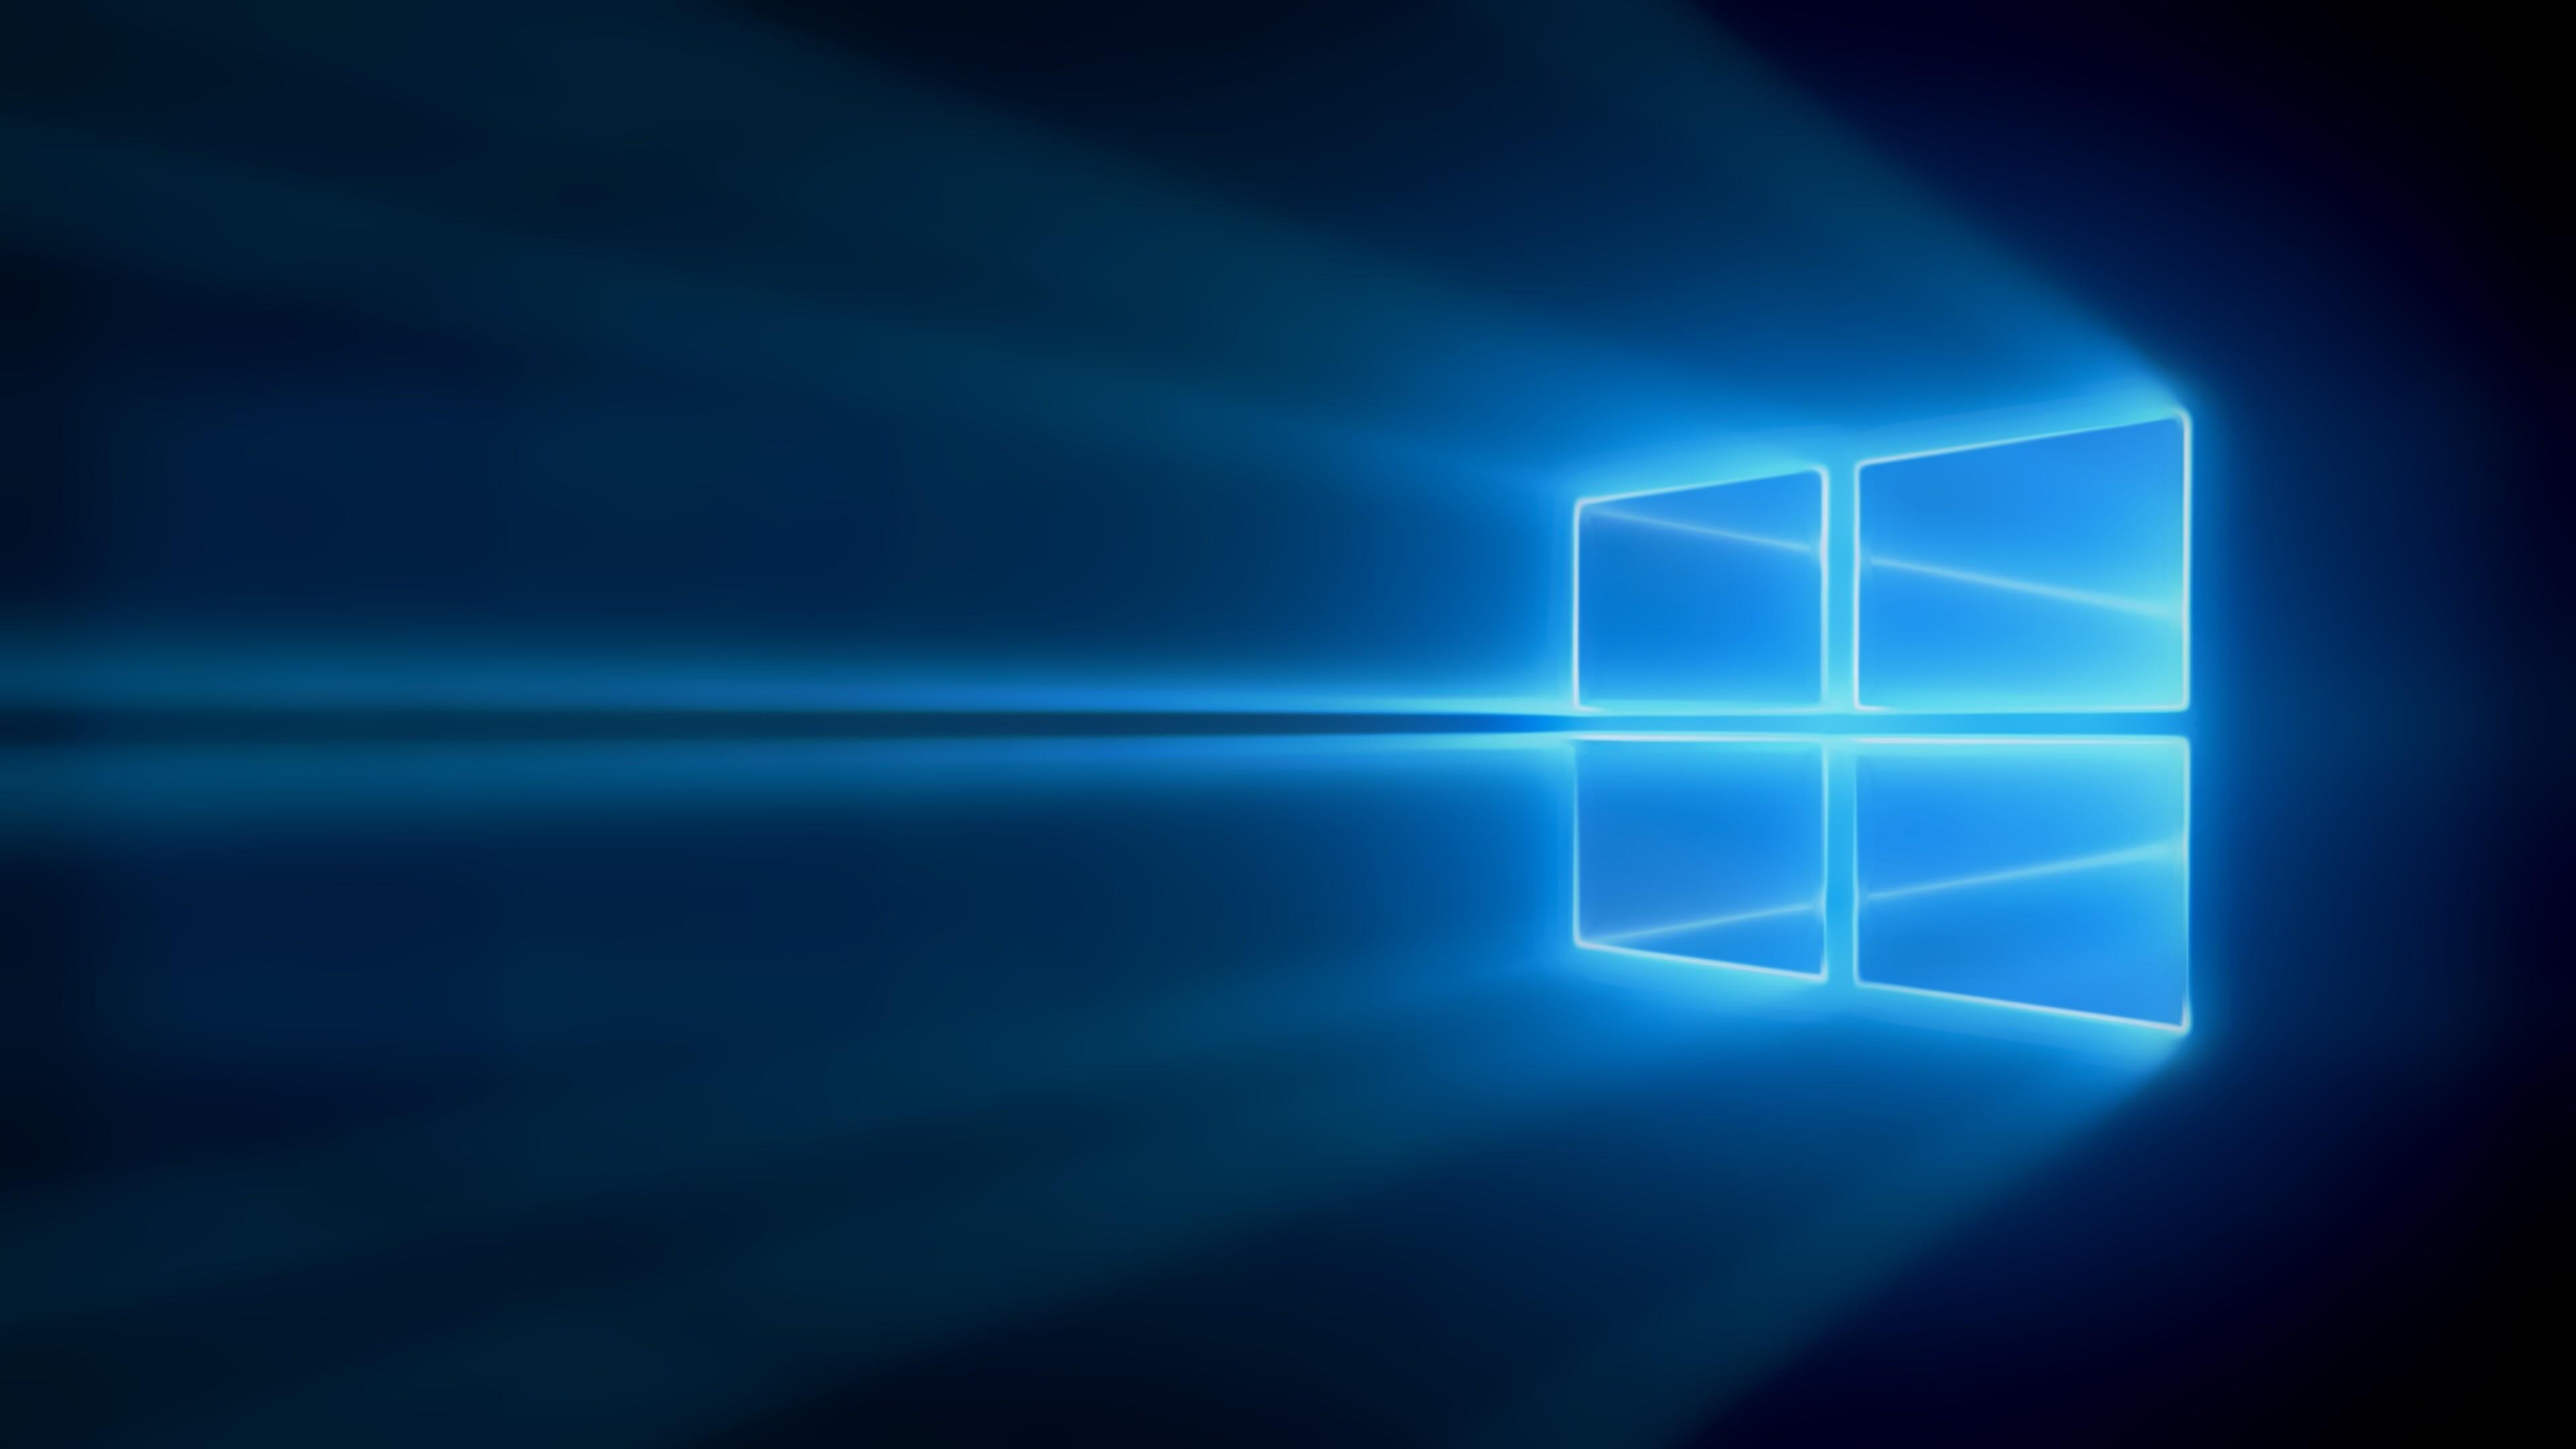 Immagini sfondo desktop windows 10